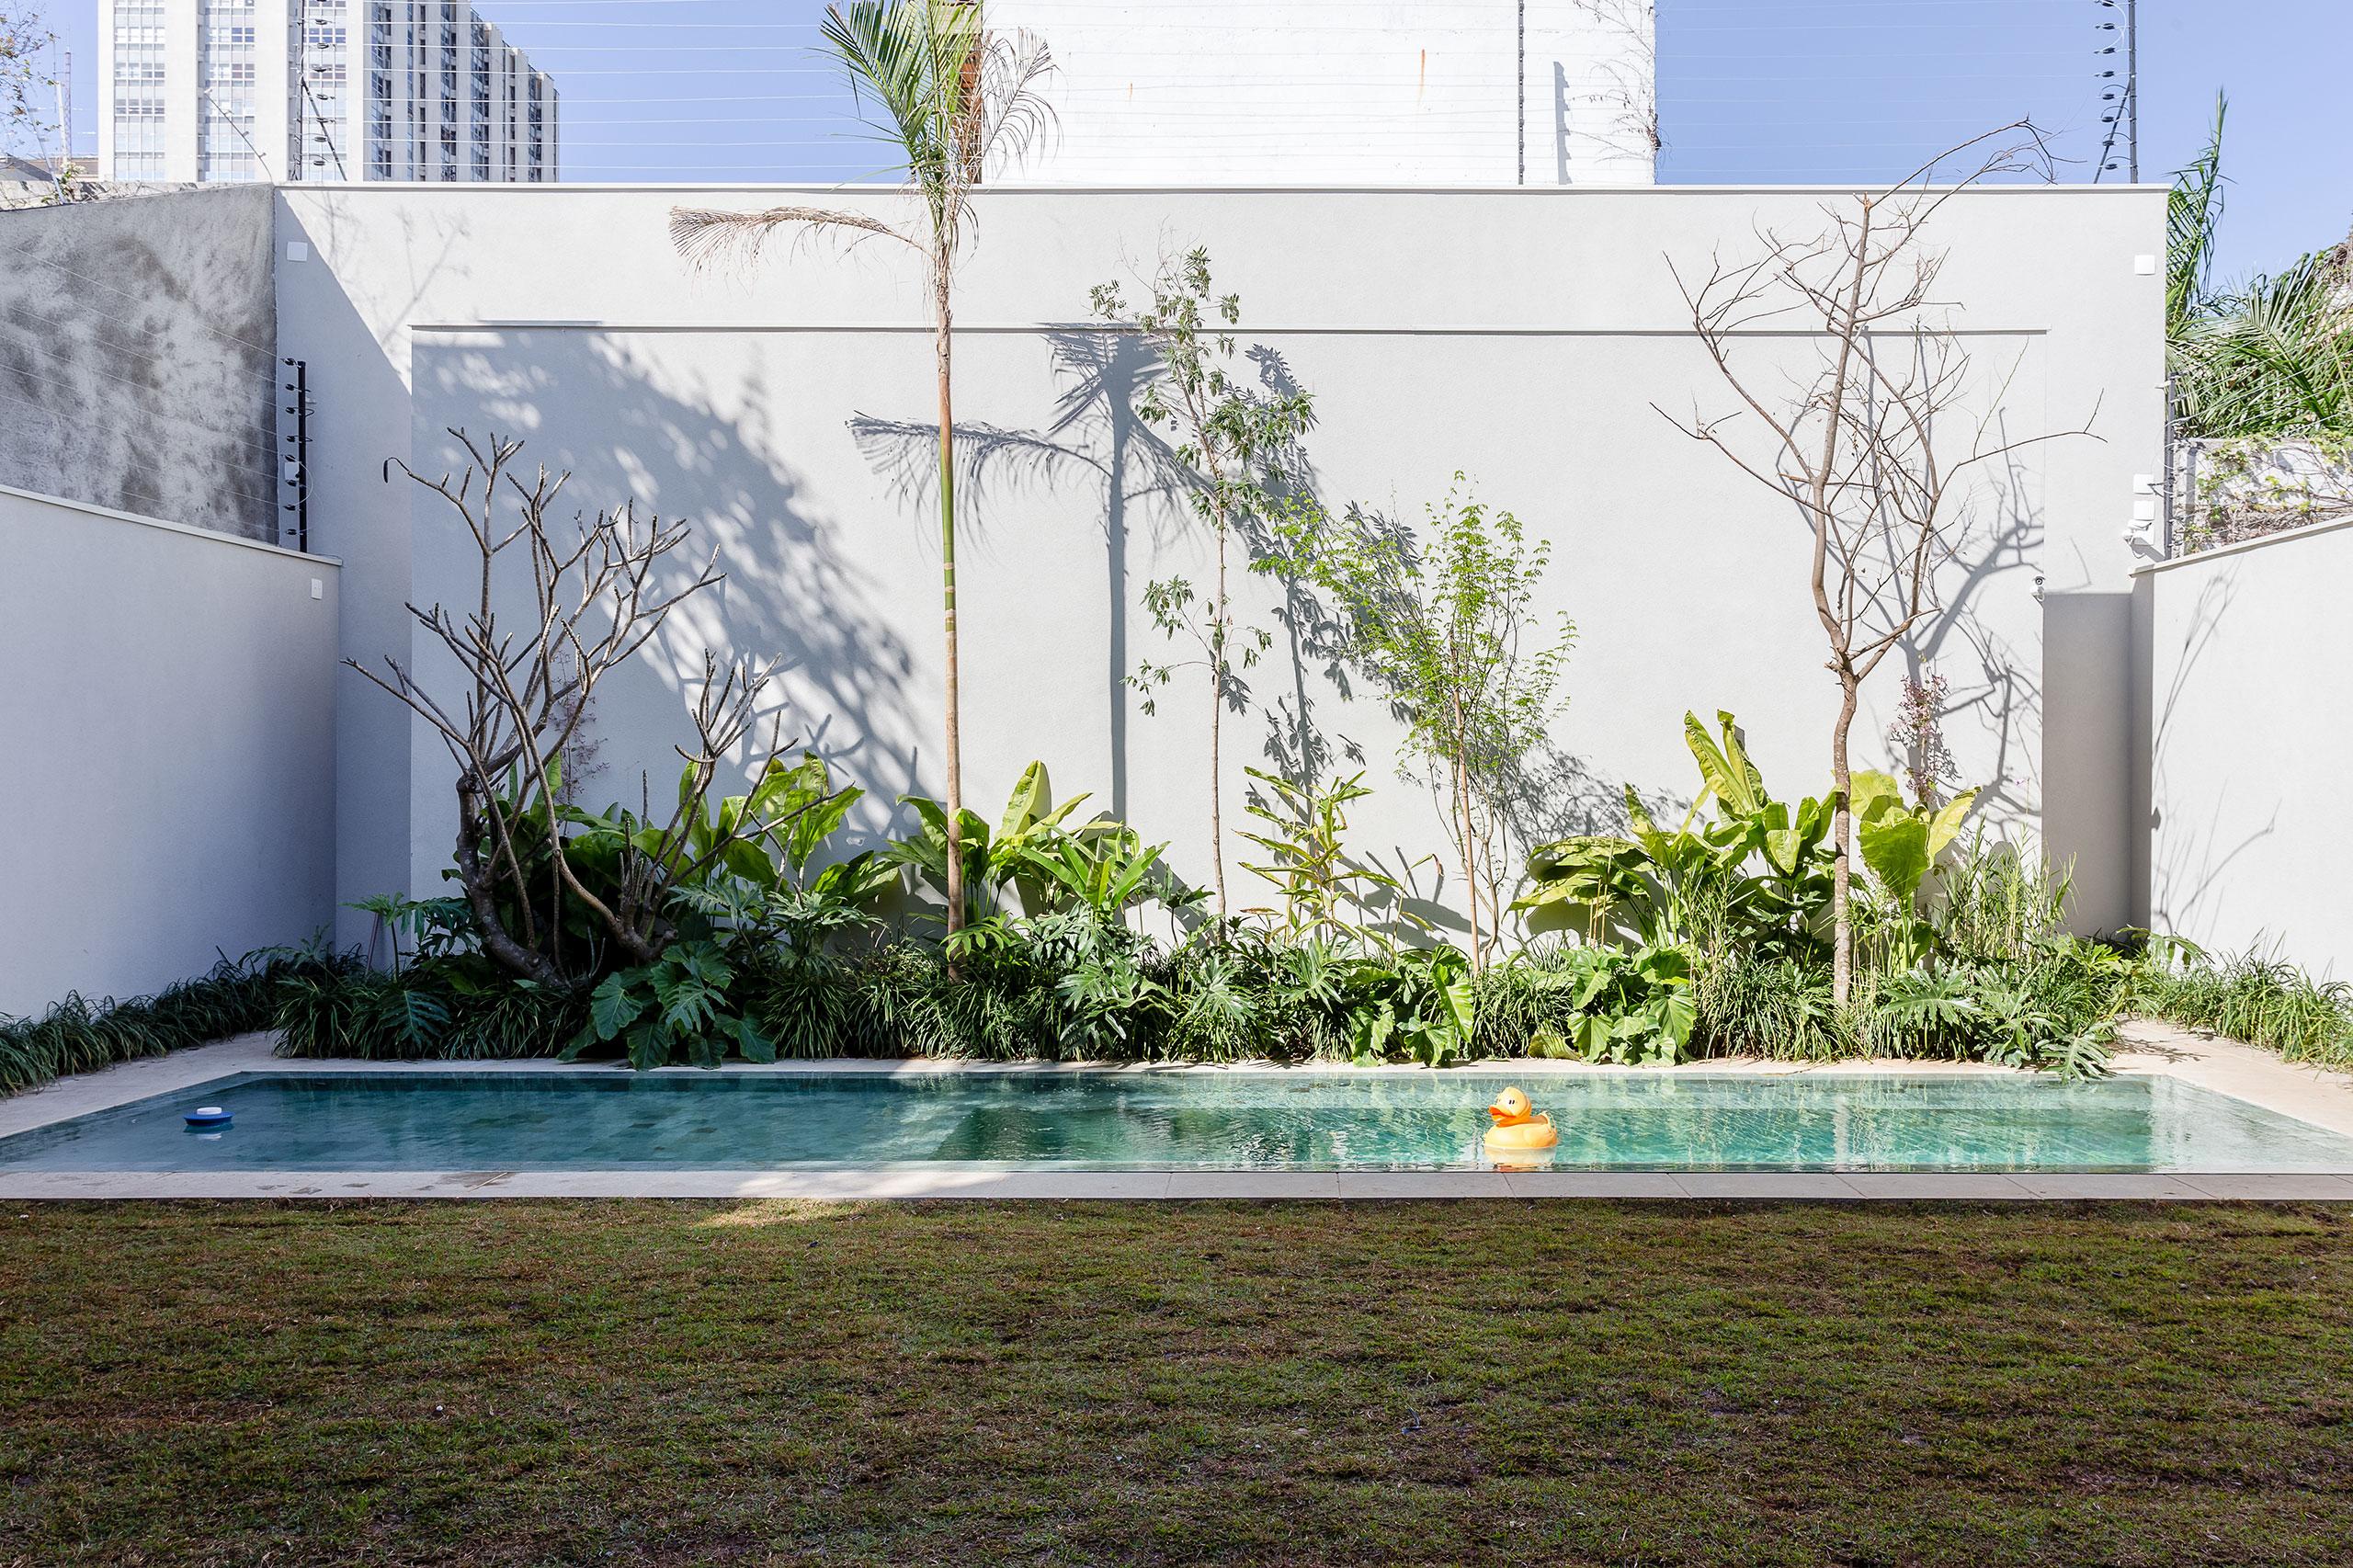 casa lara by felipe hess7 Lara House in Brasil by Felipe Hess